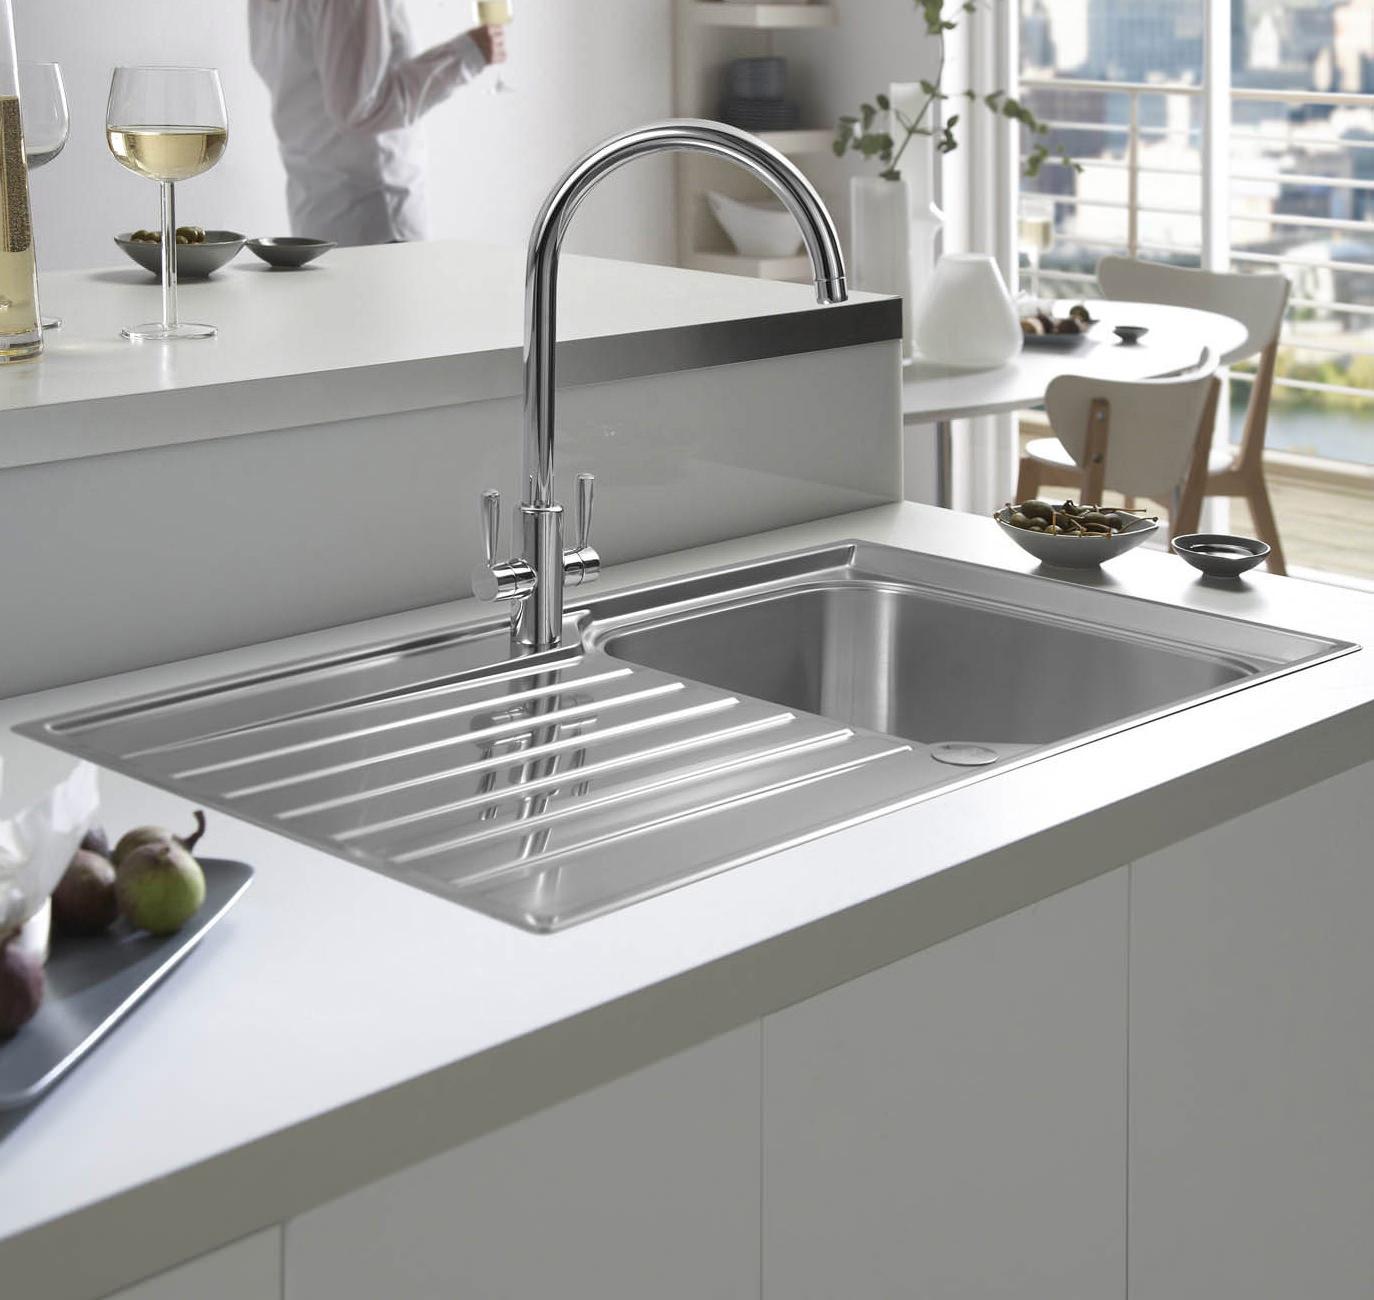 Franke Inset Sink : ... of Franke Ascona ASX 611-100 Stainless Steel 1.0 Bowl Inset Sink